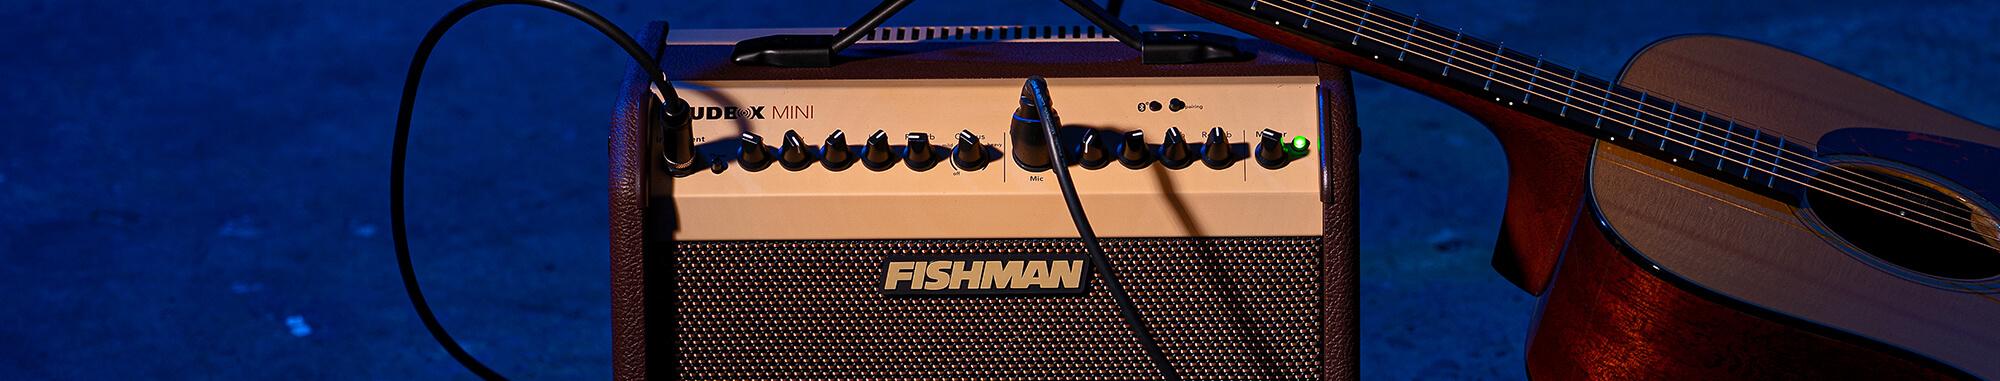 Fishman Loudbox Mini acoustic guitar